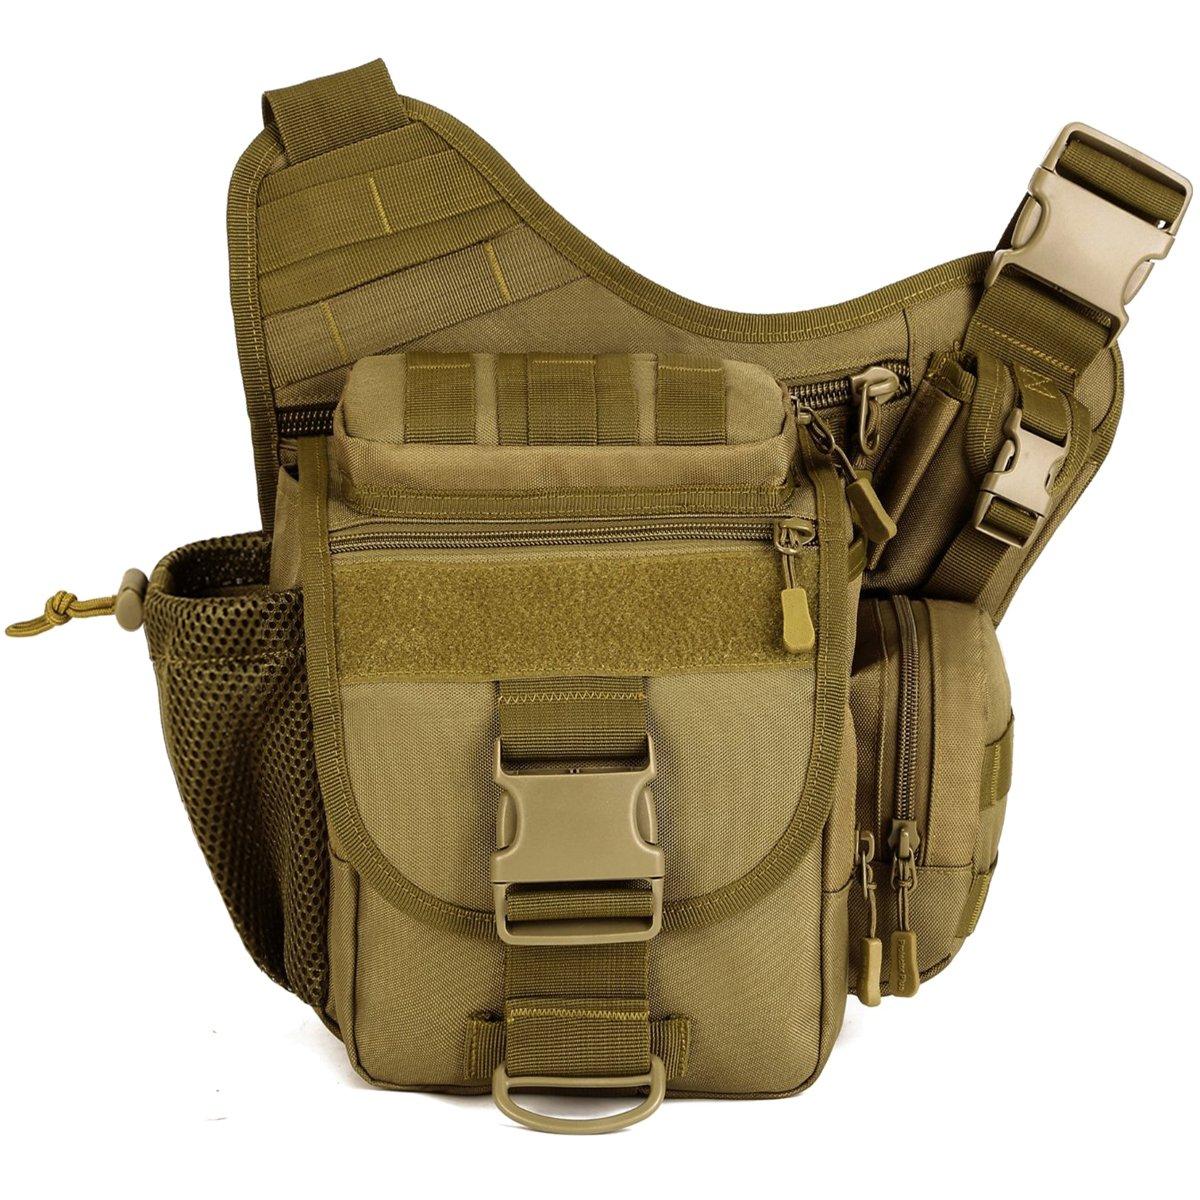 Tactical Bags, Upgraded Version Outdoor Lightweight & Durable DSLR Camera Photography Multi-functional Tactical Messenger Single Shoulder Bag, Super Saddle Bag (Black) Protector Plus